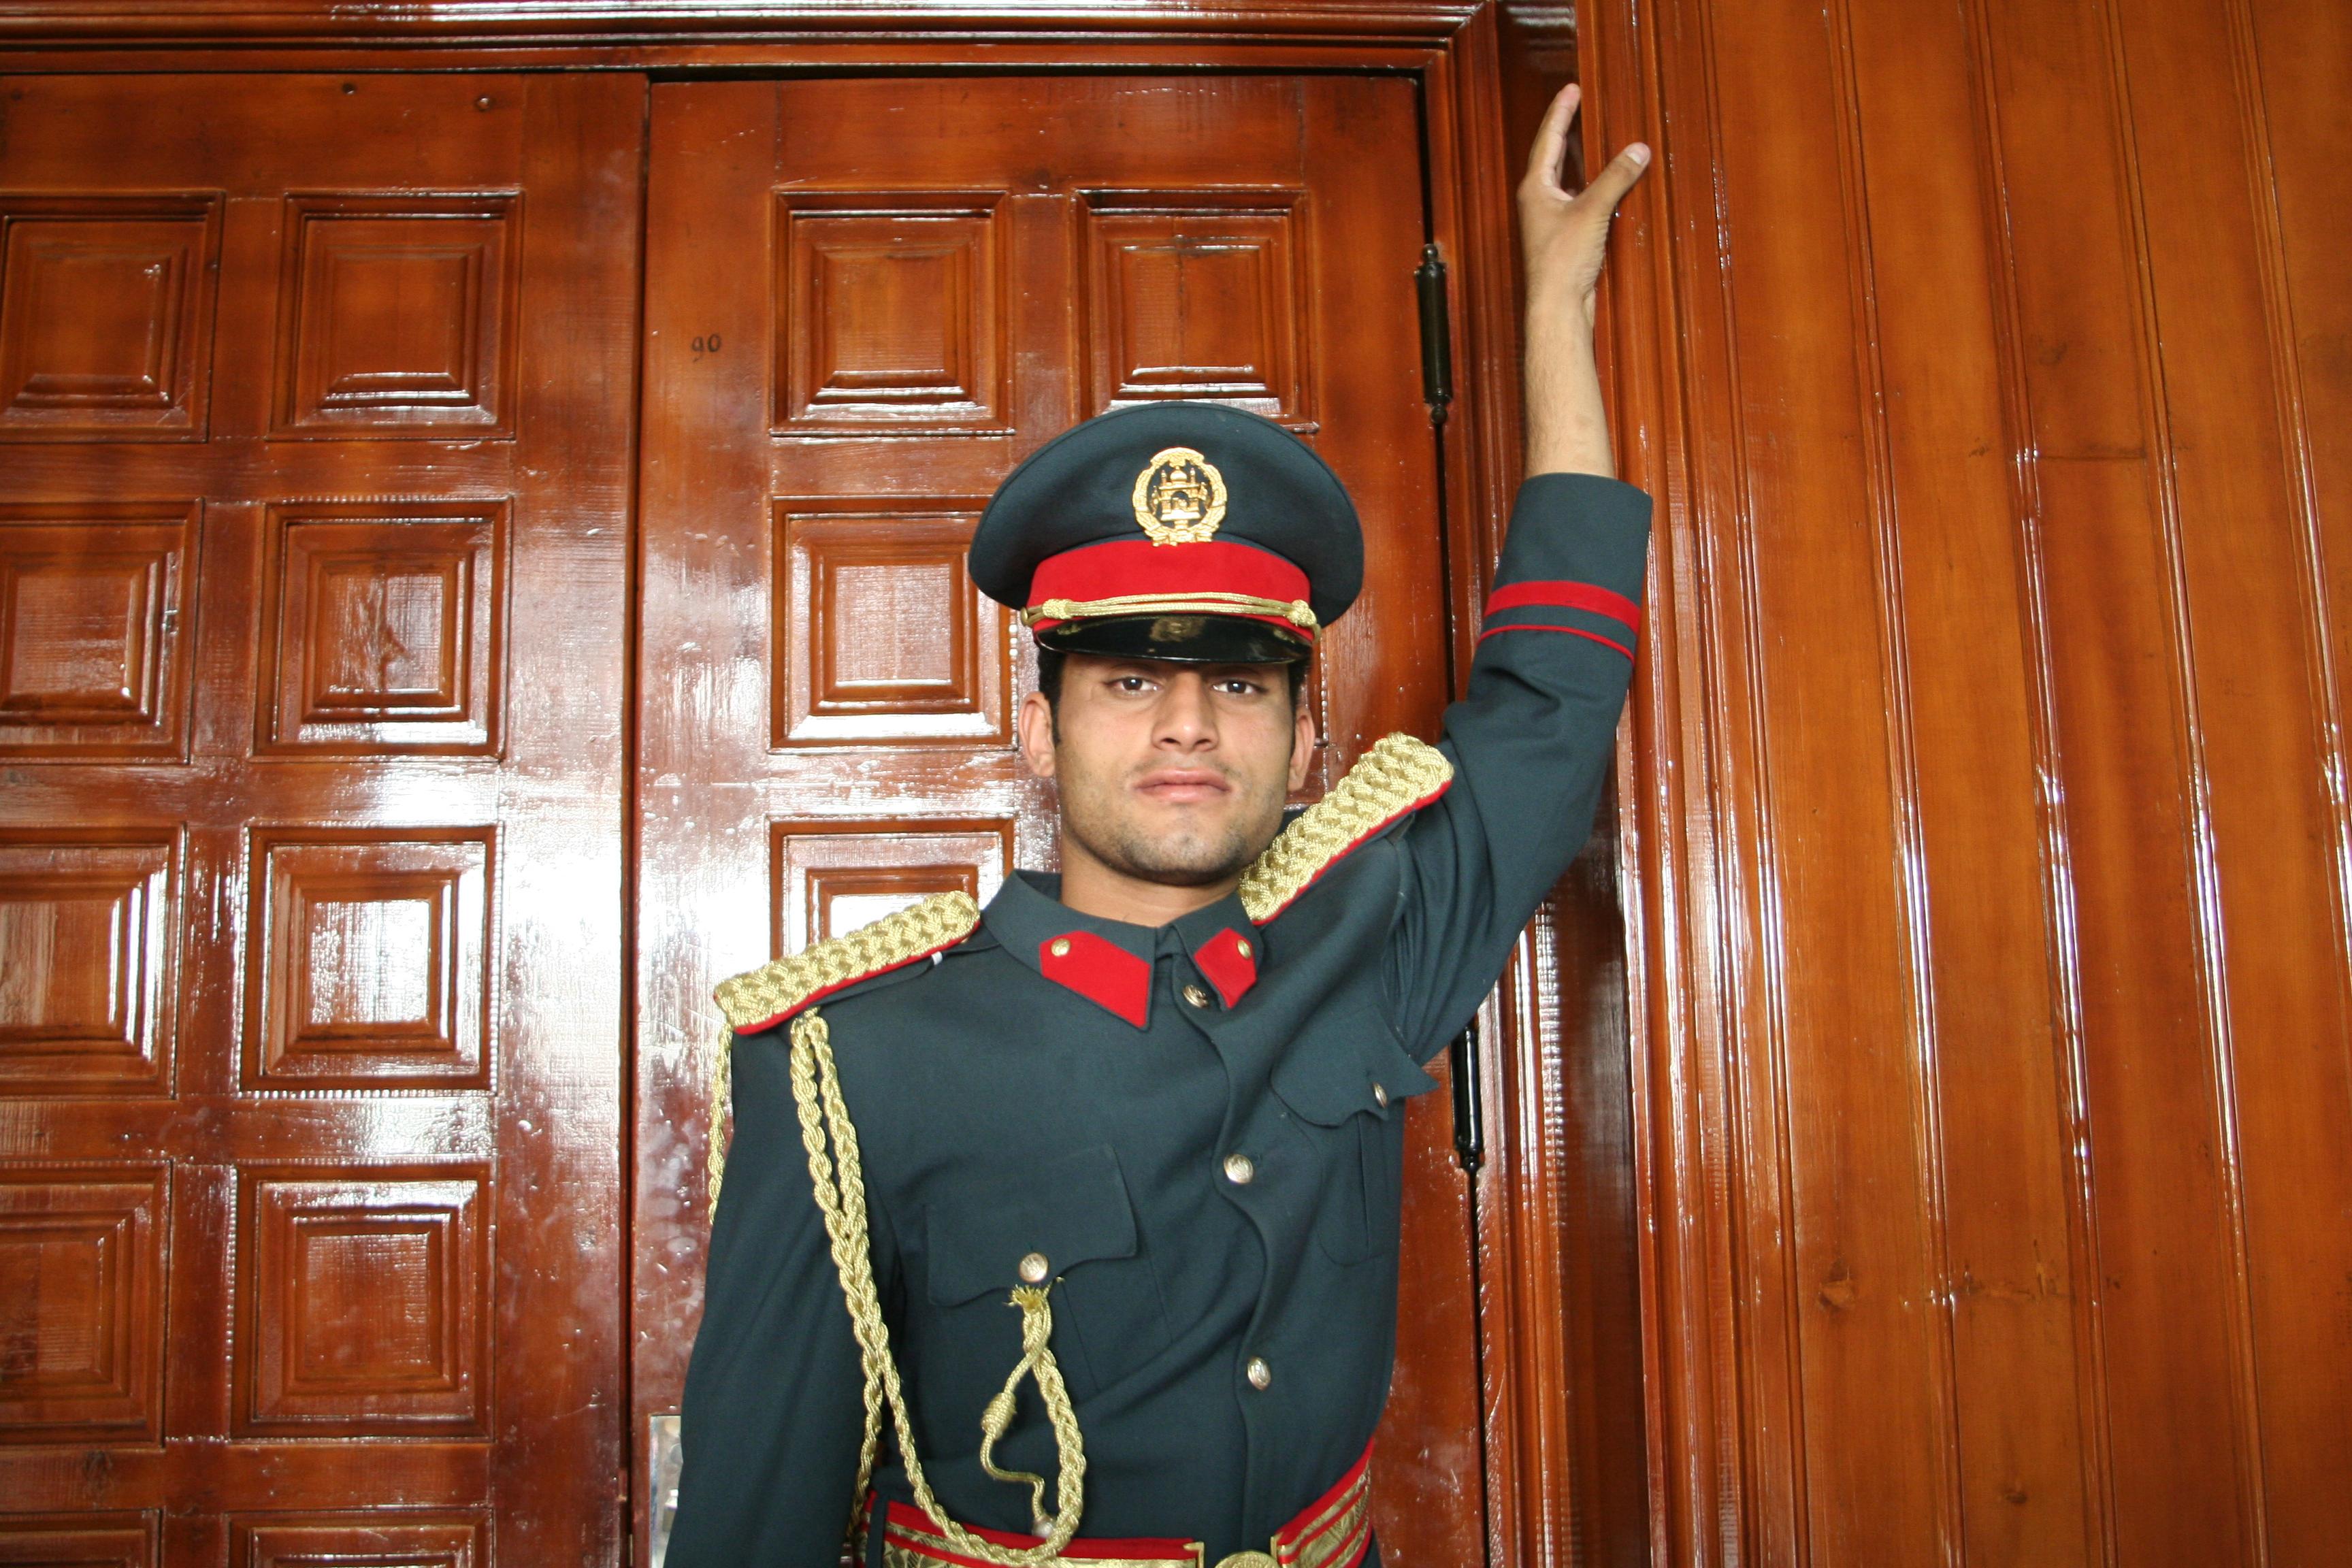 Parlamentswache